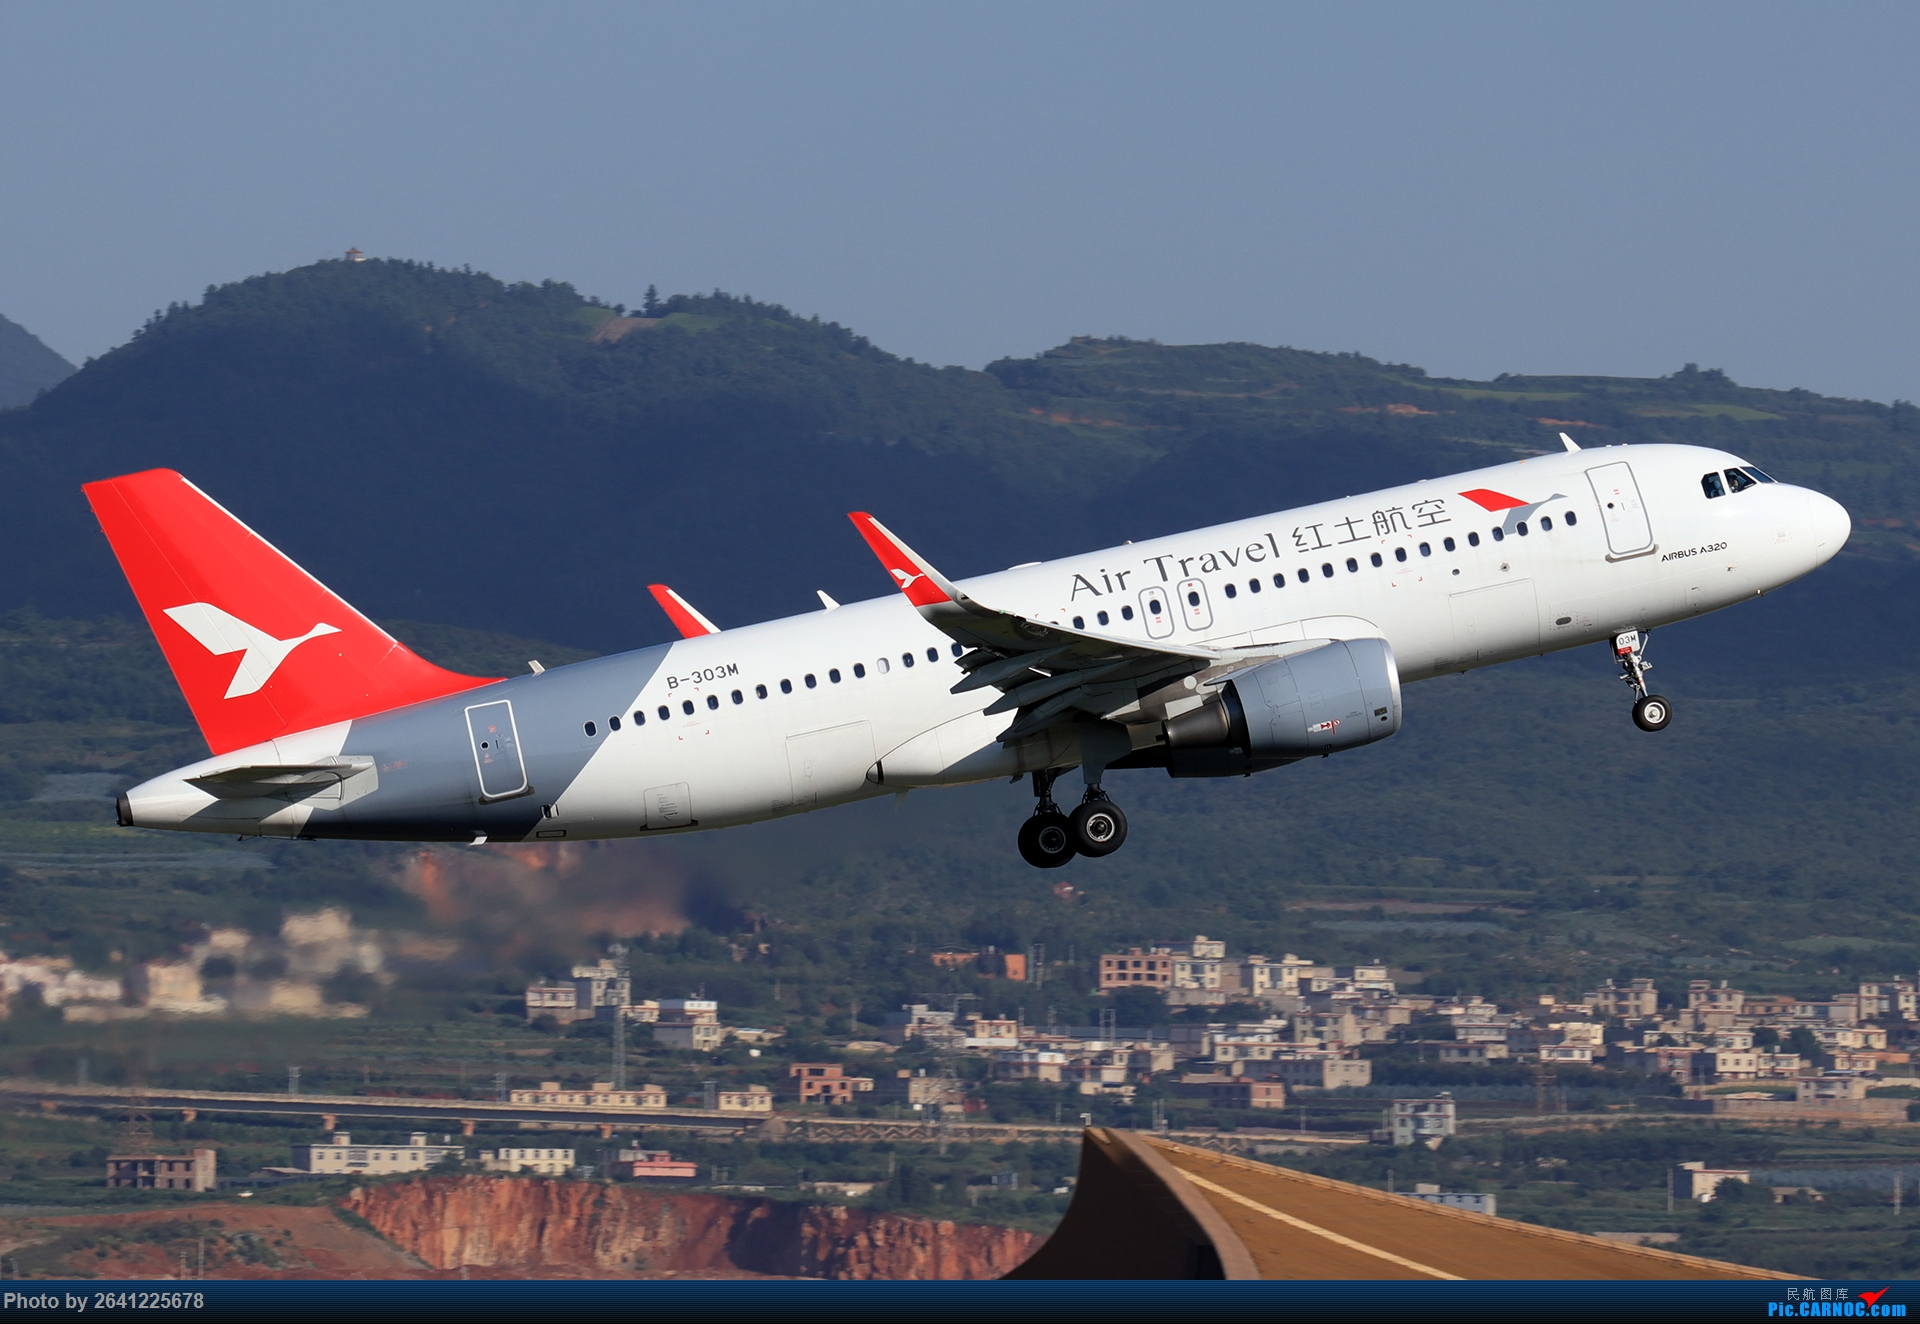 Re:[原创]【KMG】又见长水(3)——晴天西跑,你们要的宽体都在这了(图略多,看官慢慢看) AIRBUS A320-200 B-303M 中国昆明长水国际机场